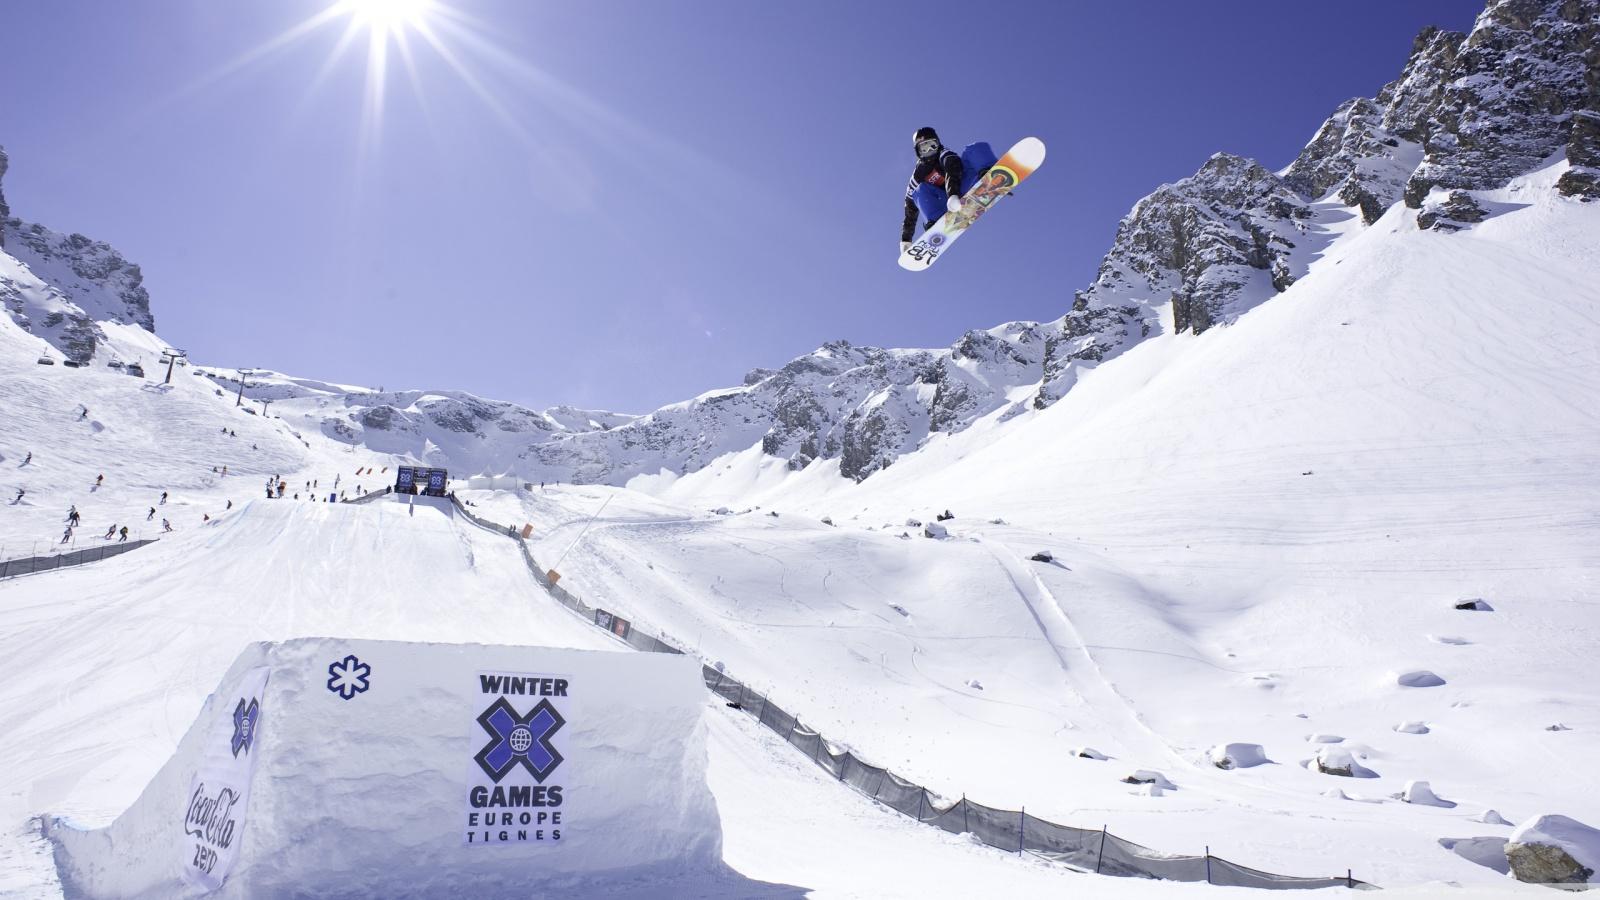 Winter Games Europe Tignes 4K HD Desktop Wallpaper for 4K Ultra 1600x900